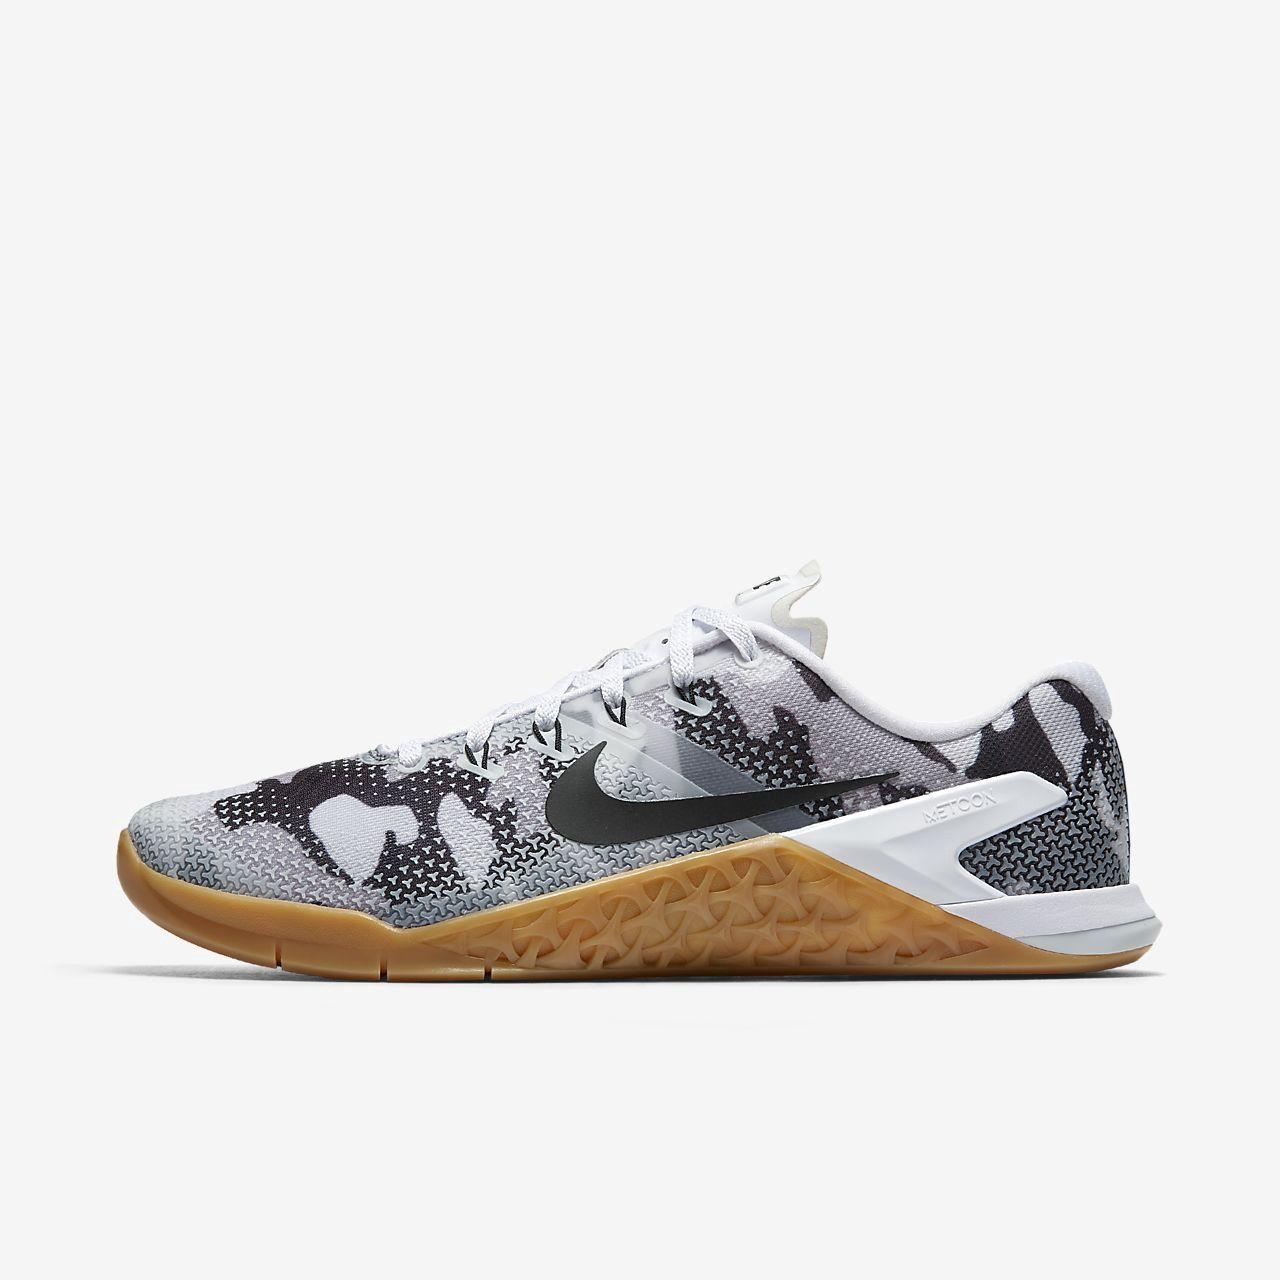 28bdeabbacf NIKE Nike Metcon 4 - Men s Cross Training